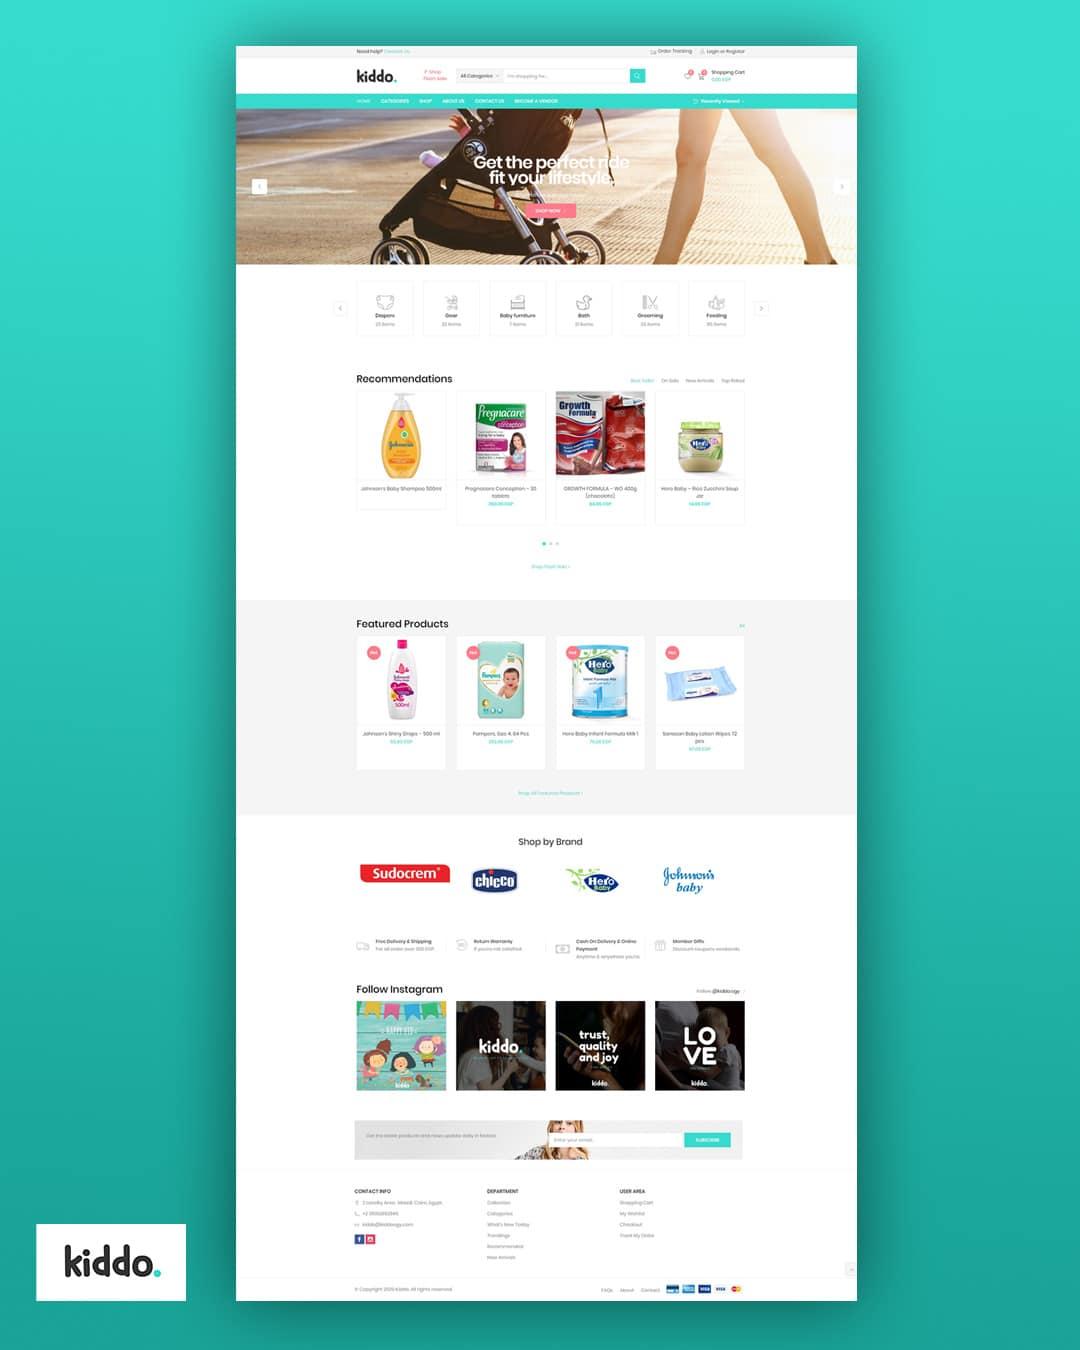 kiddo-website-design-development-waleedsayed